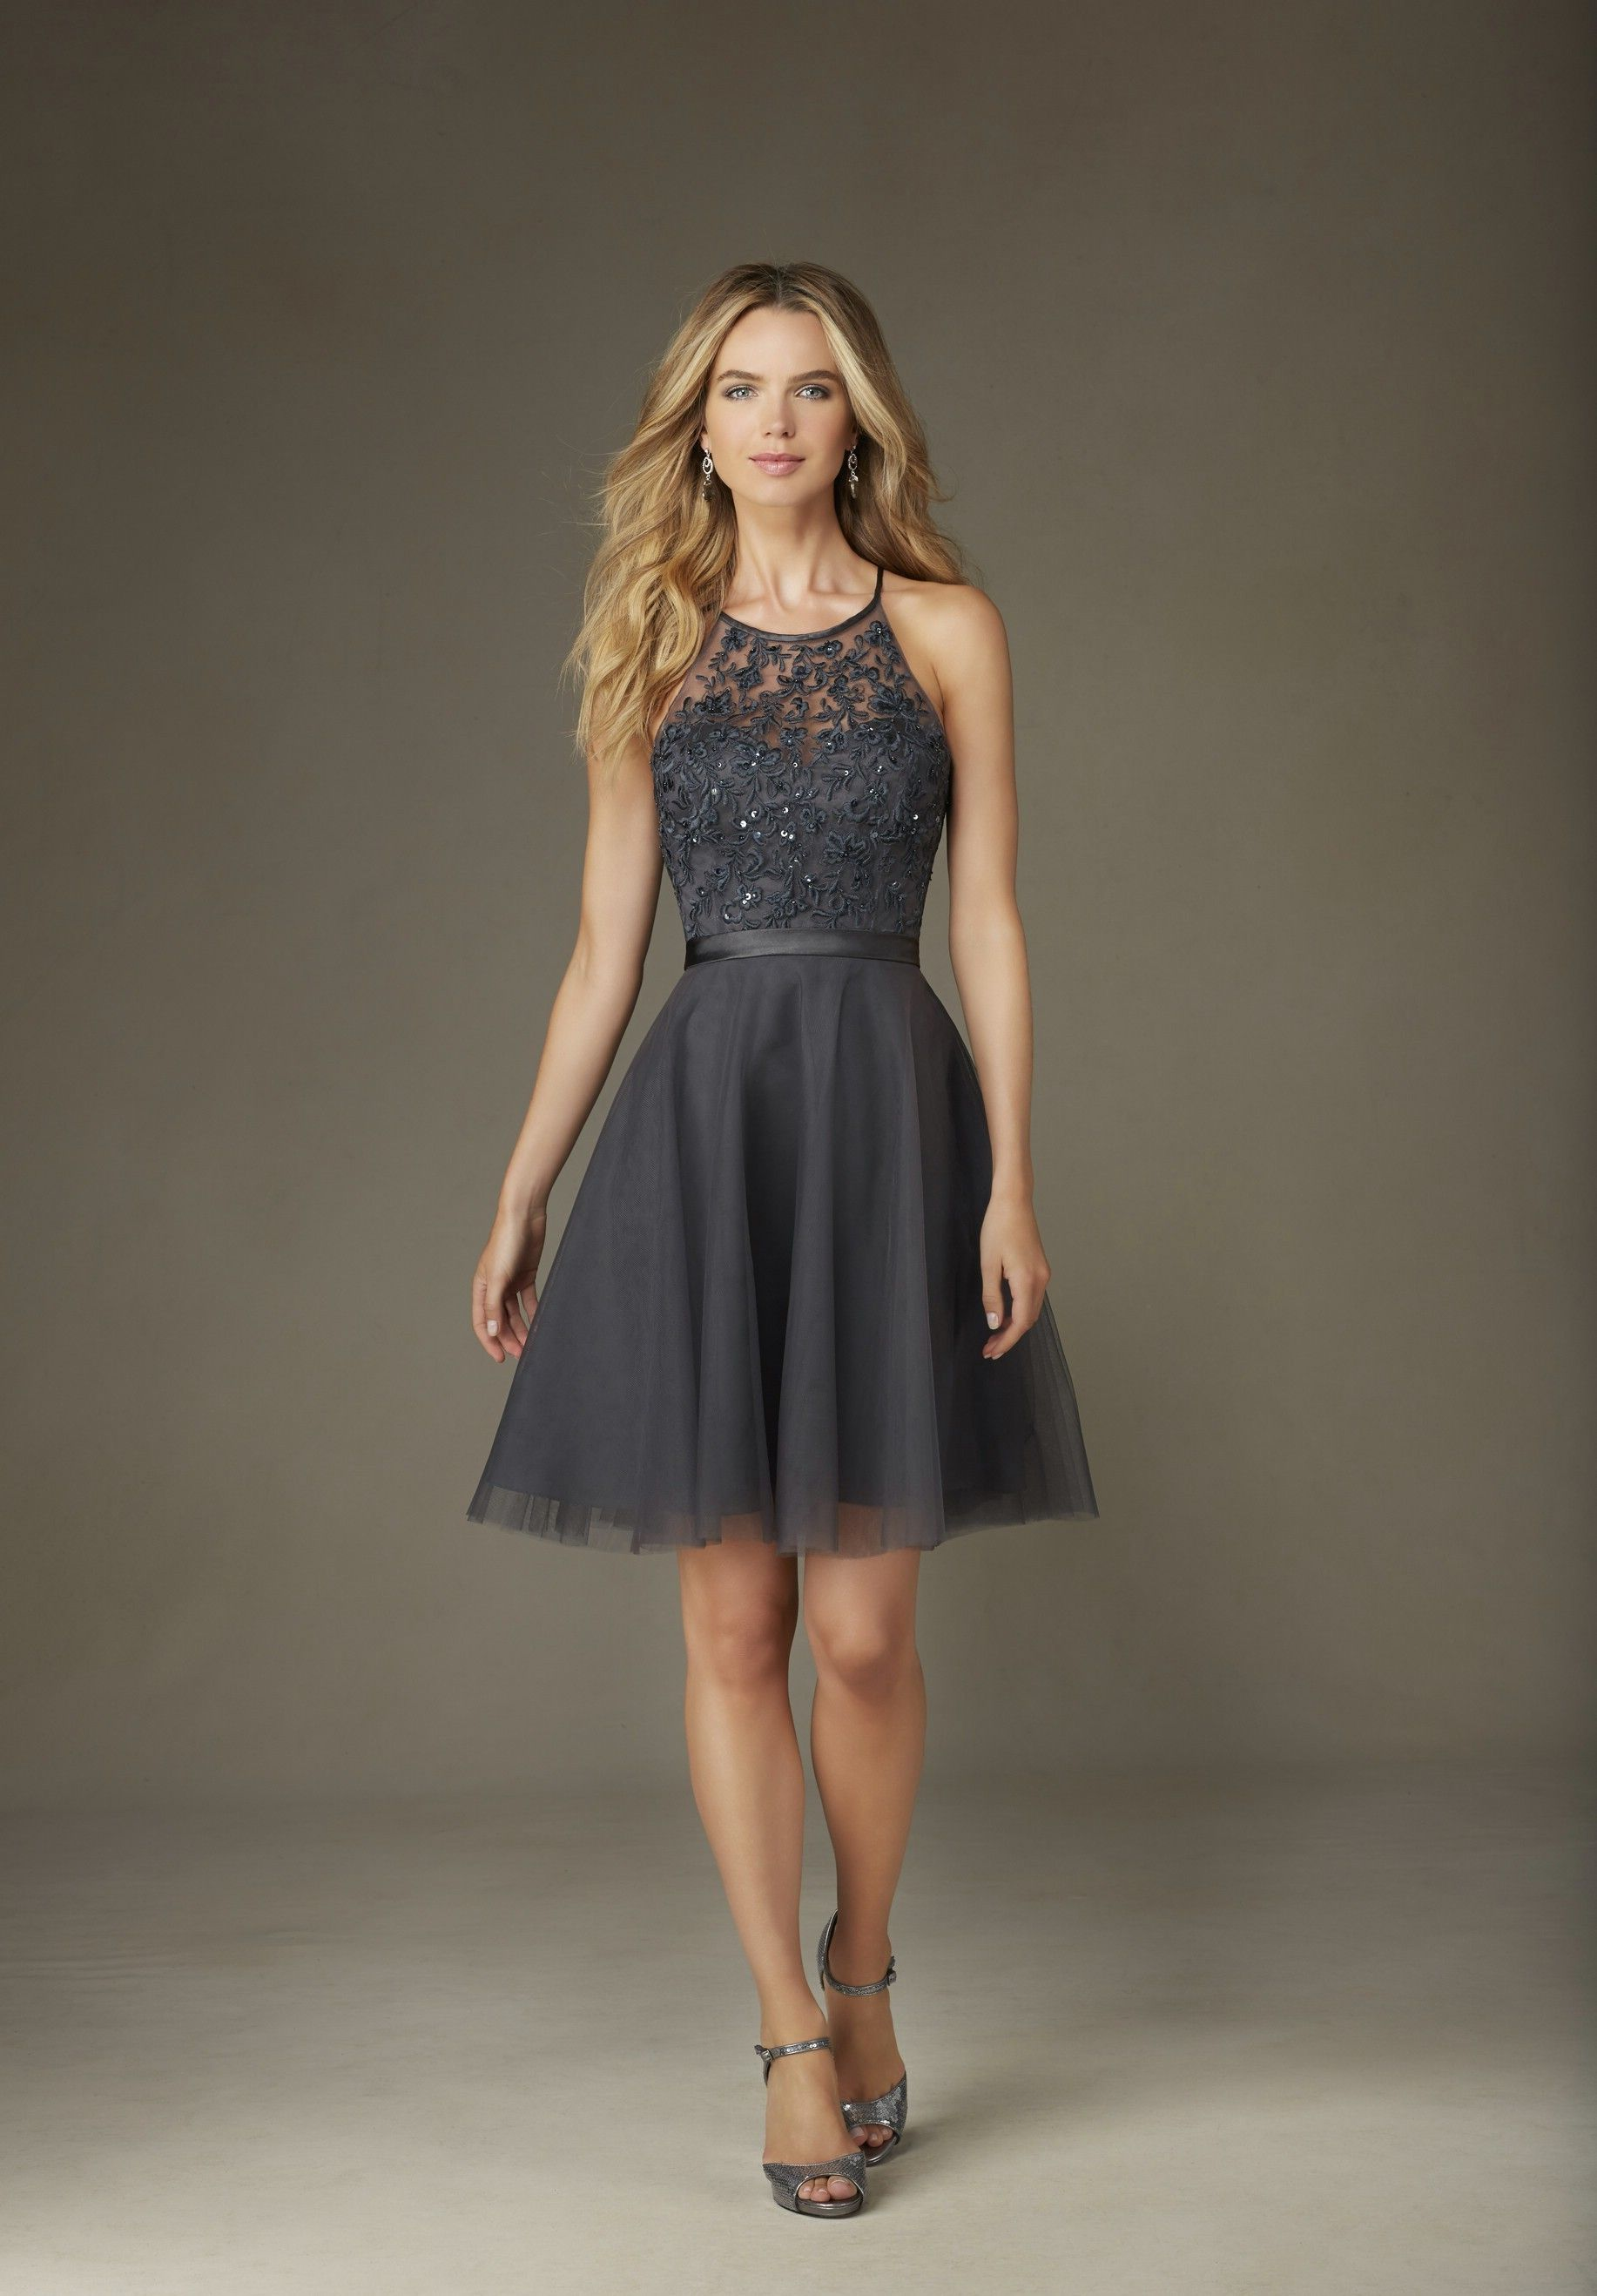 Mori Lee Tulle Affairs - Style 135 [135] - $160.00 : Wedding Dresses ...